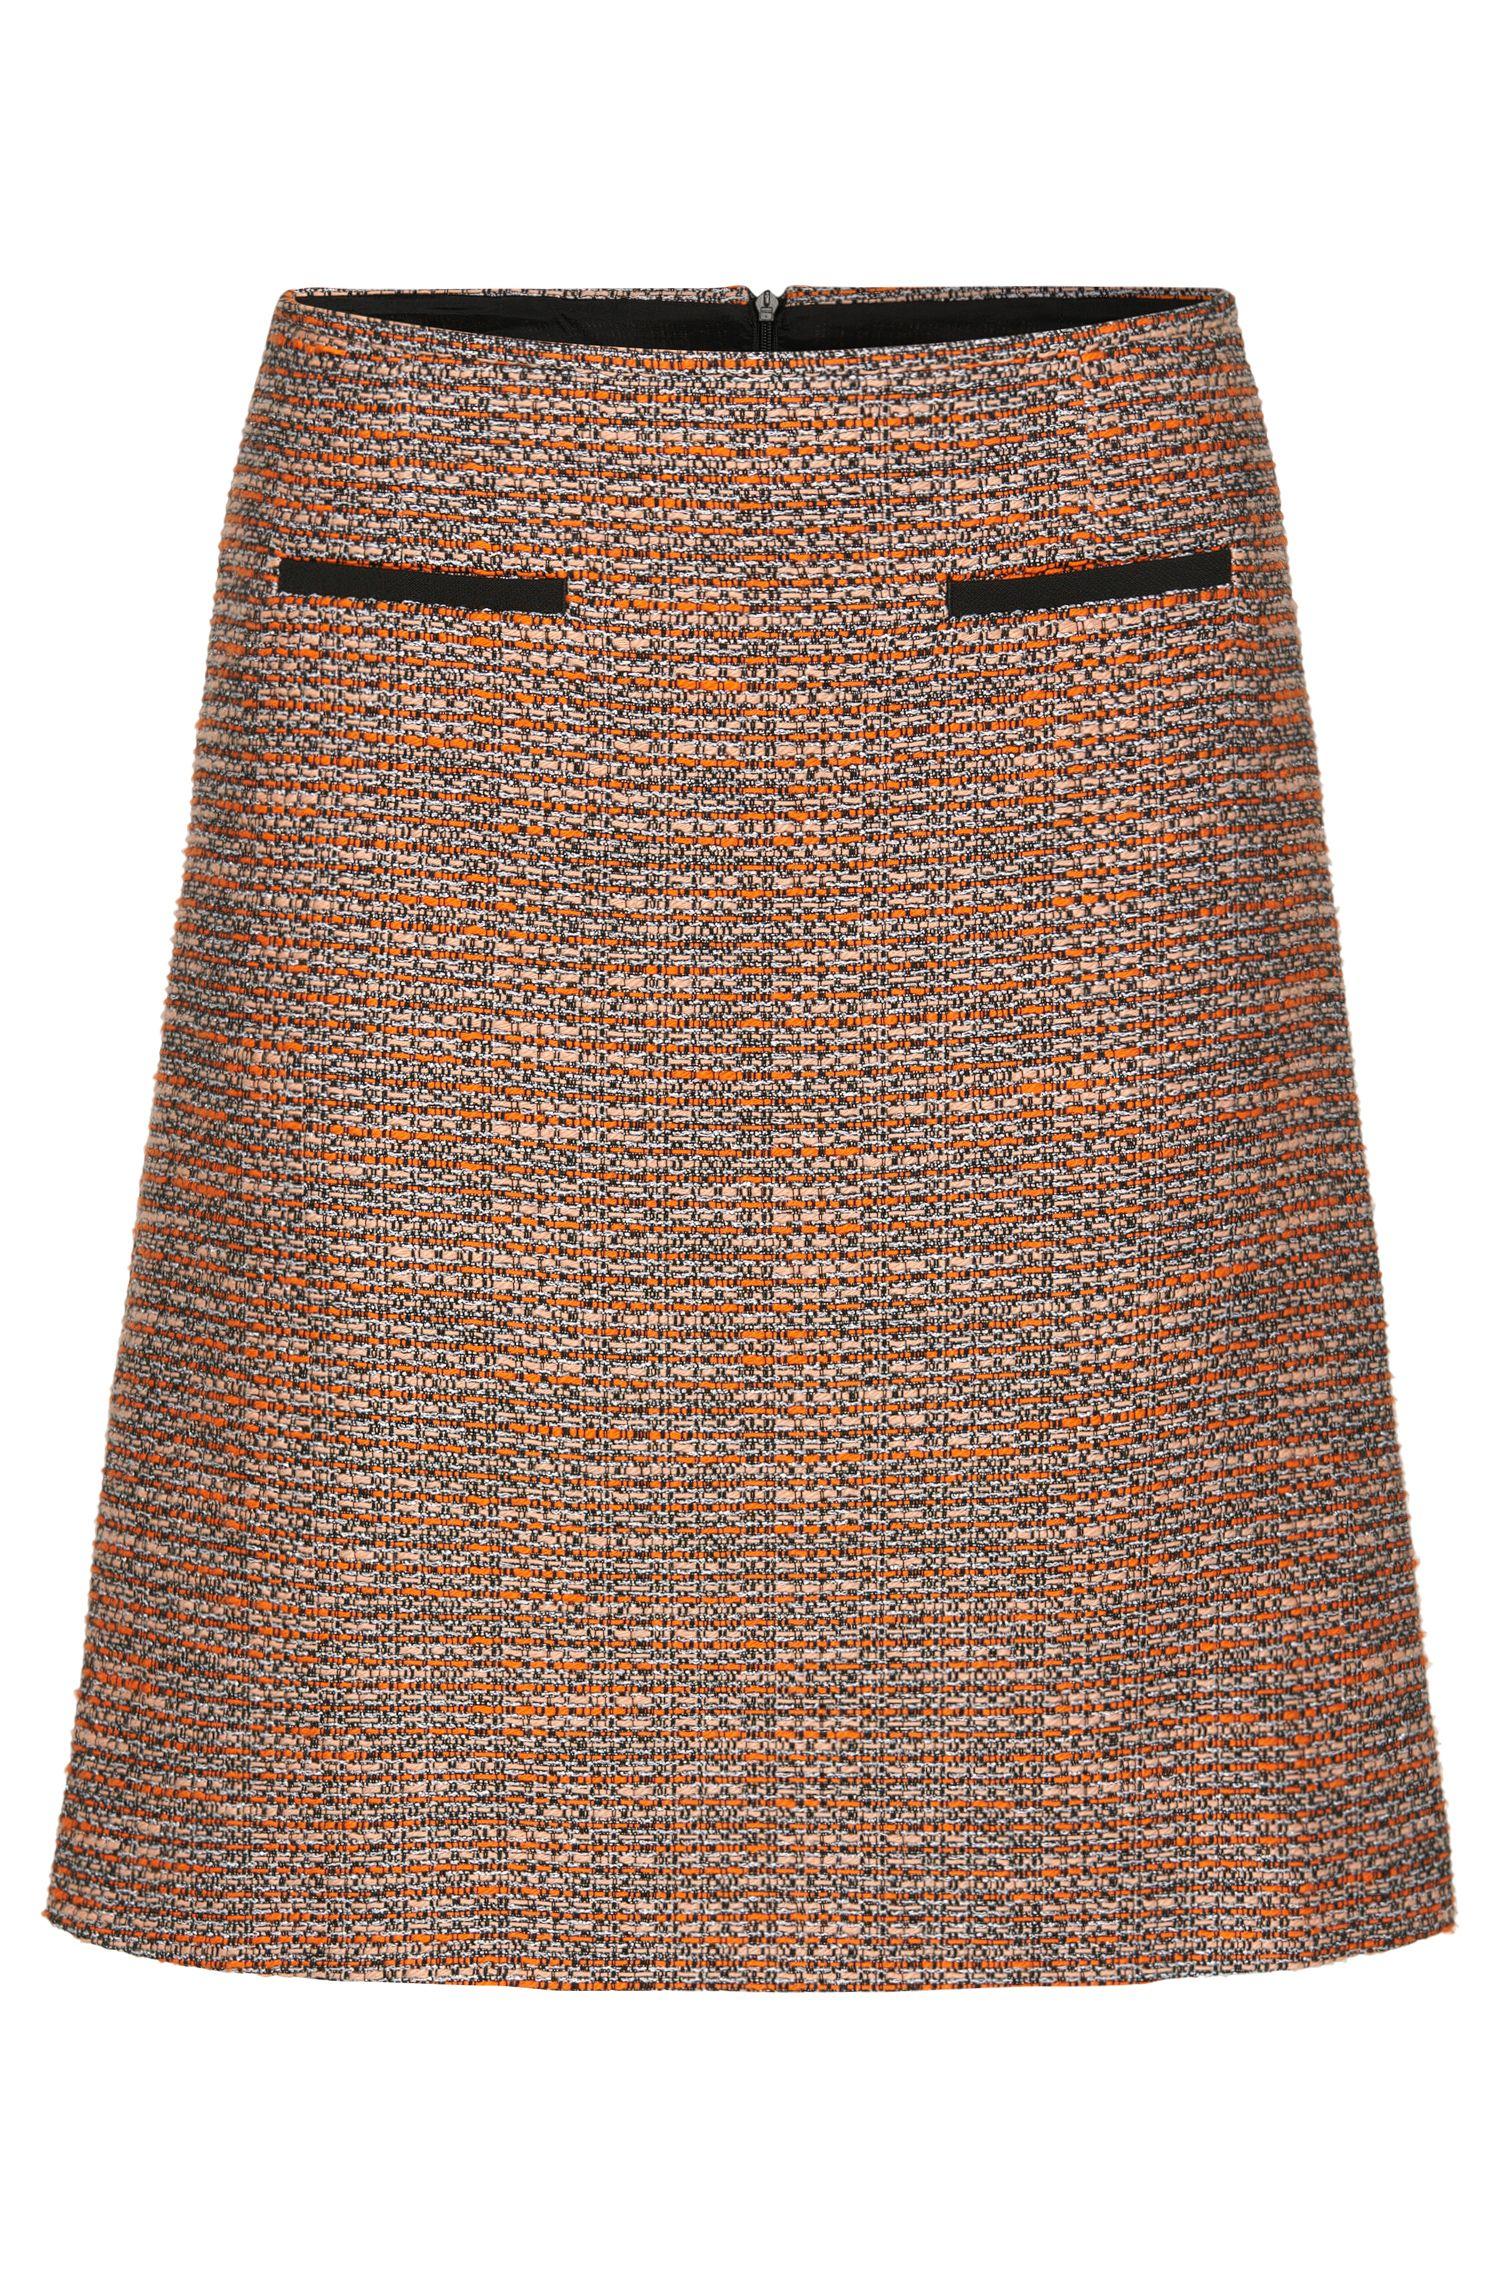 Skirt in a bouclé-look cotton blend: 'Relini-4'